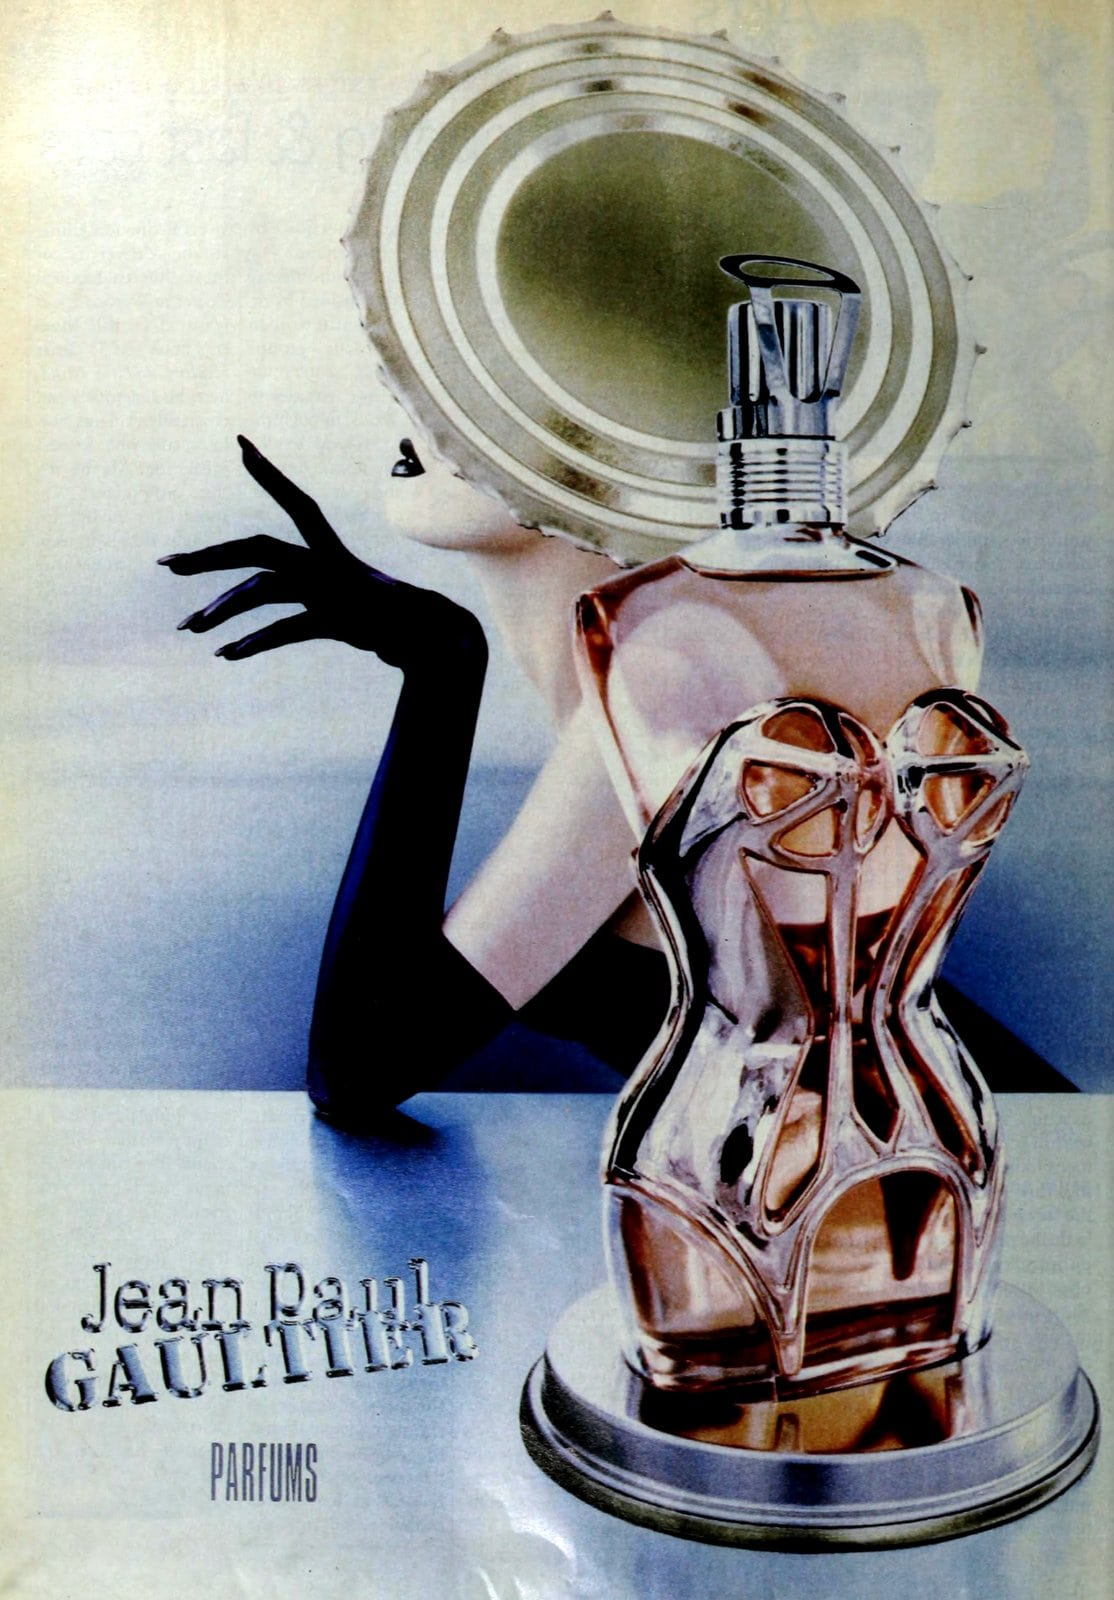 Jean Paul Gaultier parfums (1995) at ClickAmericana com